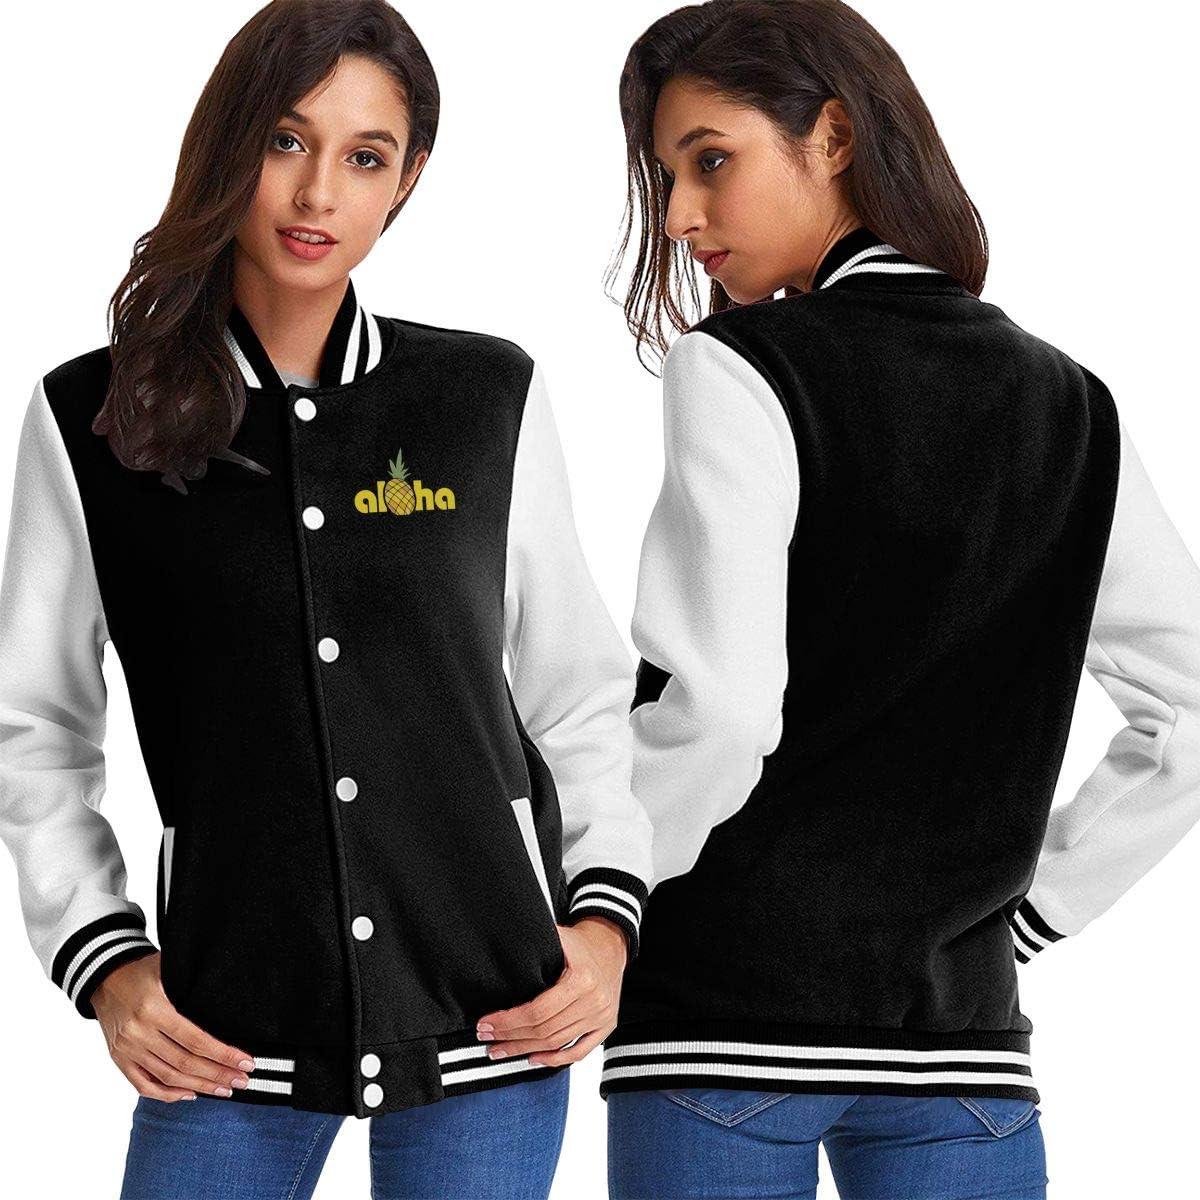 Aloha Womens Baseball Coat Uniform Sweater Very popular! Clearance SALE Limited time